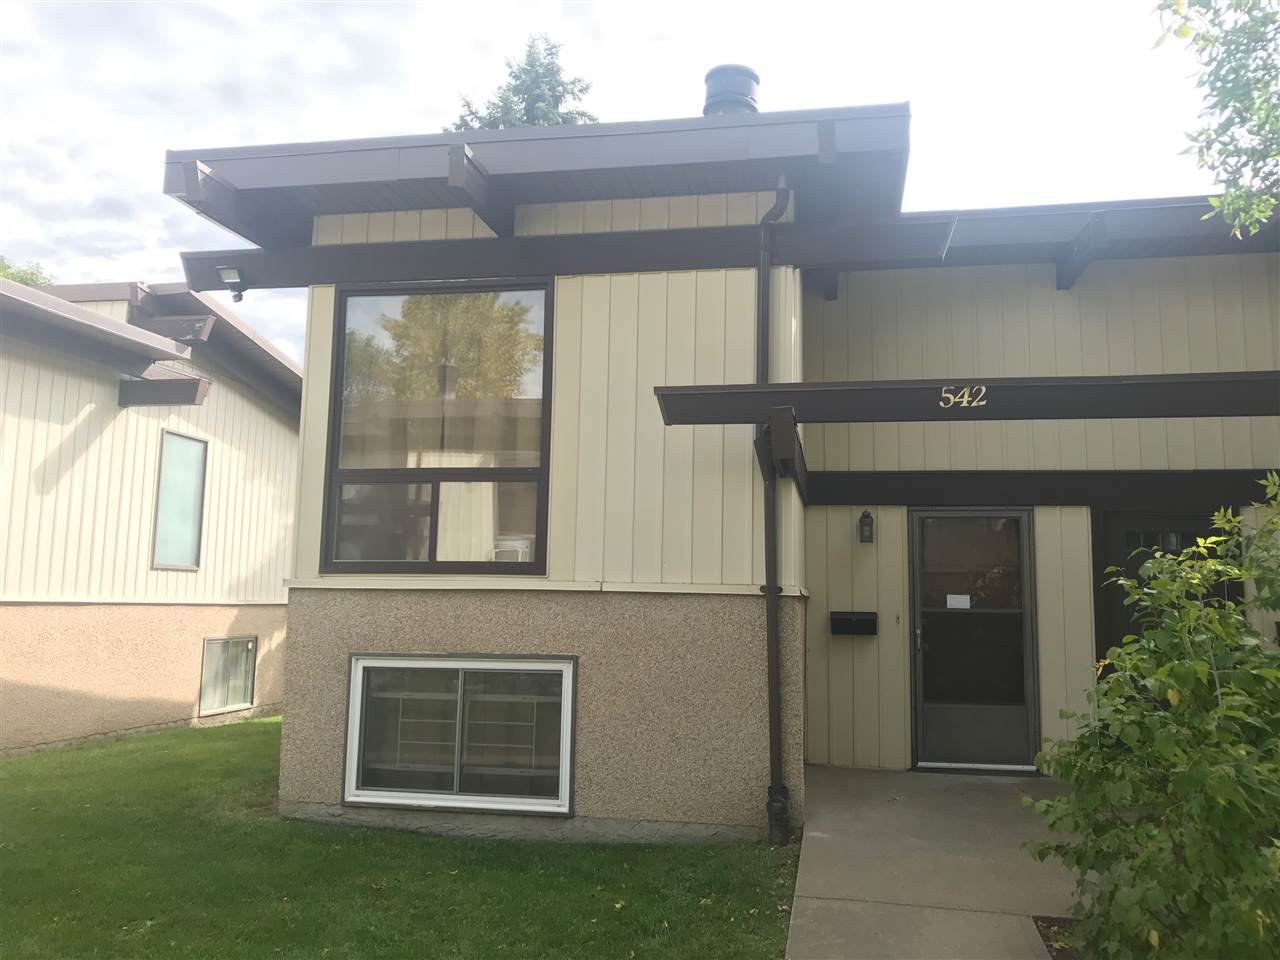 Main Photo: 542 LEE_RIDGE Road in Edmonton: Zone 29 House Half Duplex for sale : MLS®# E4212686